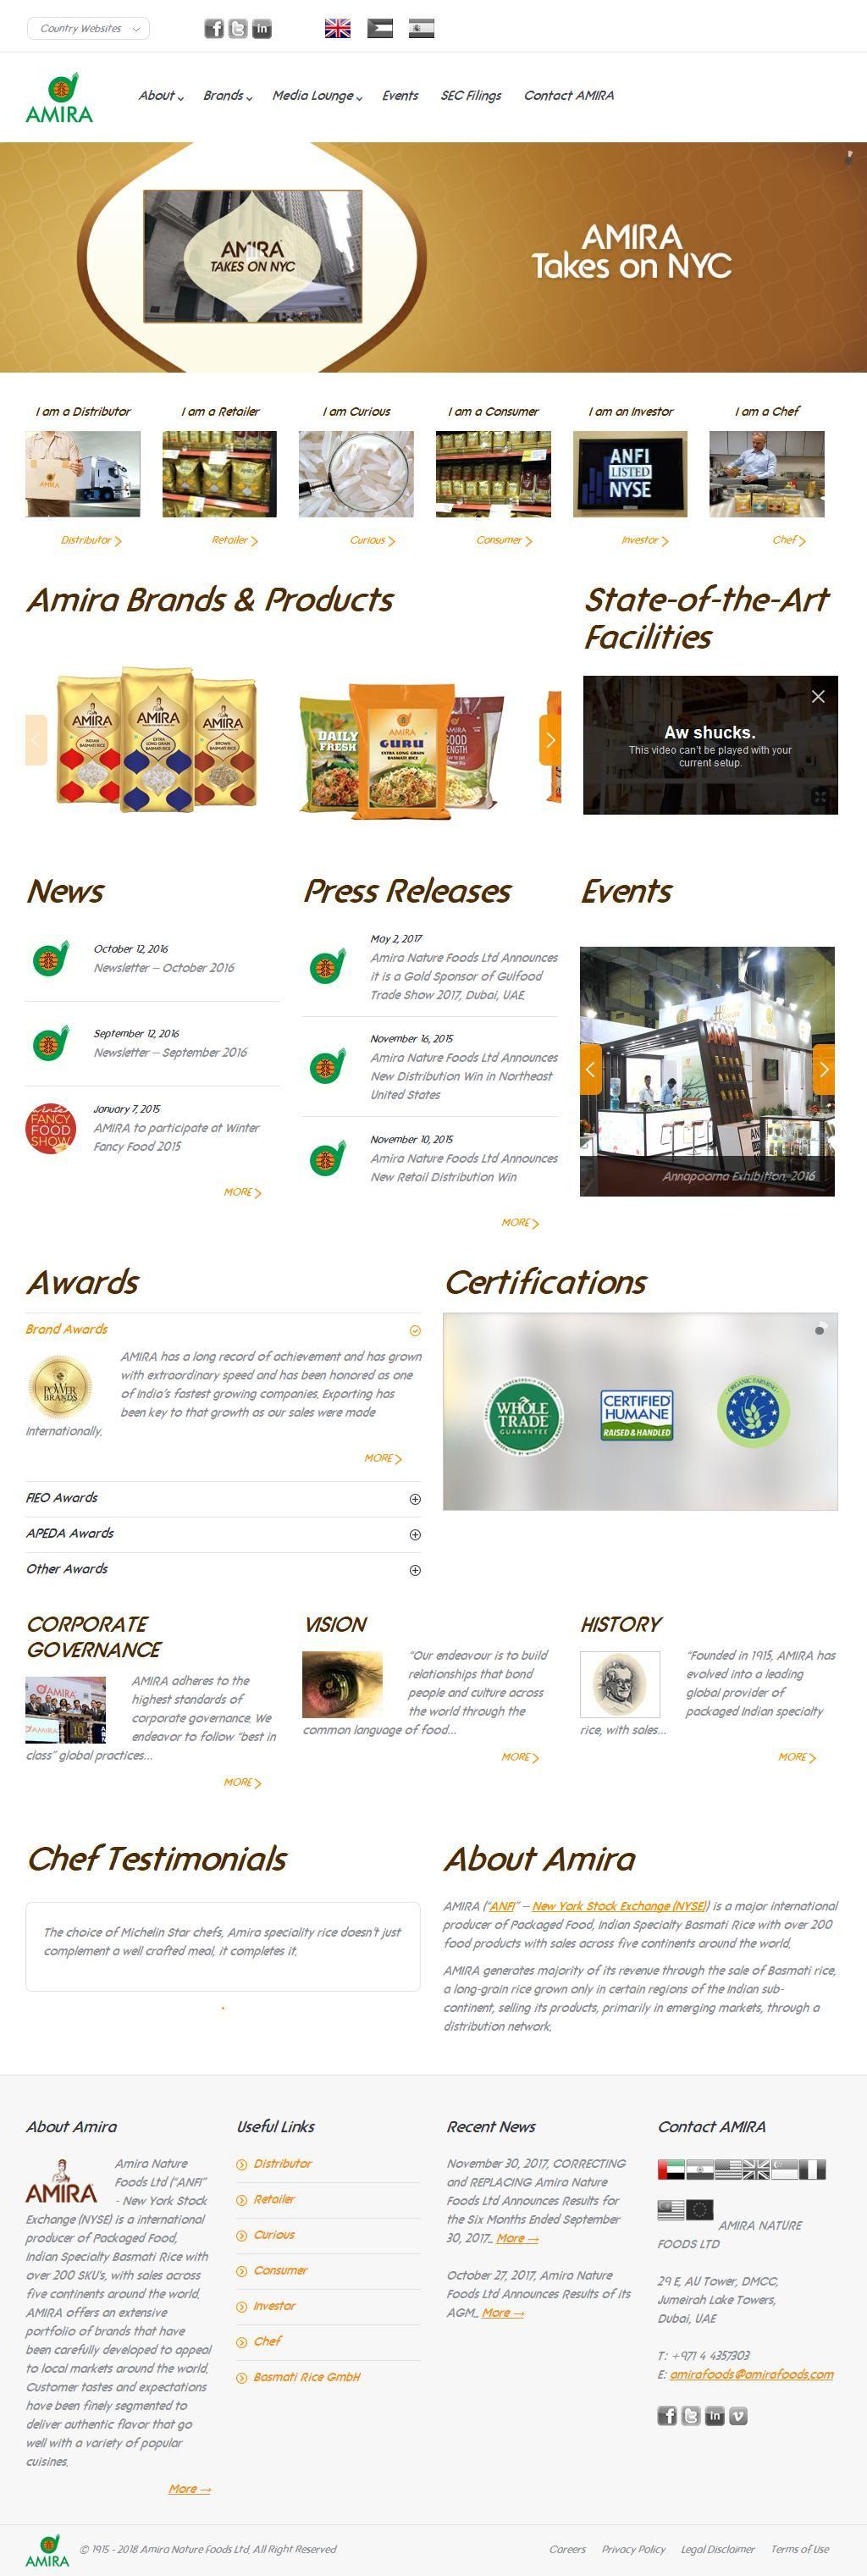 Amira C Foods International Dmcc Trading Company 4, Sikka 20a G